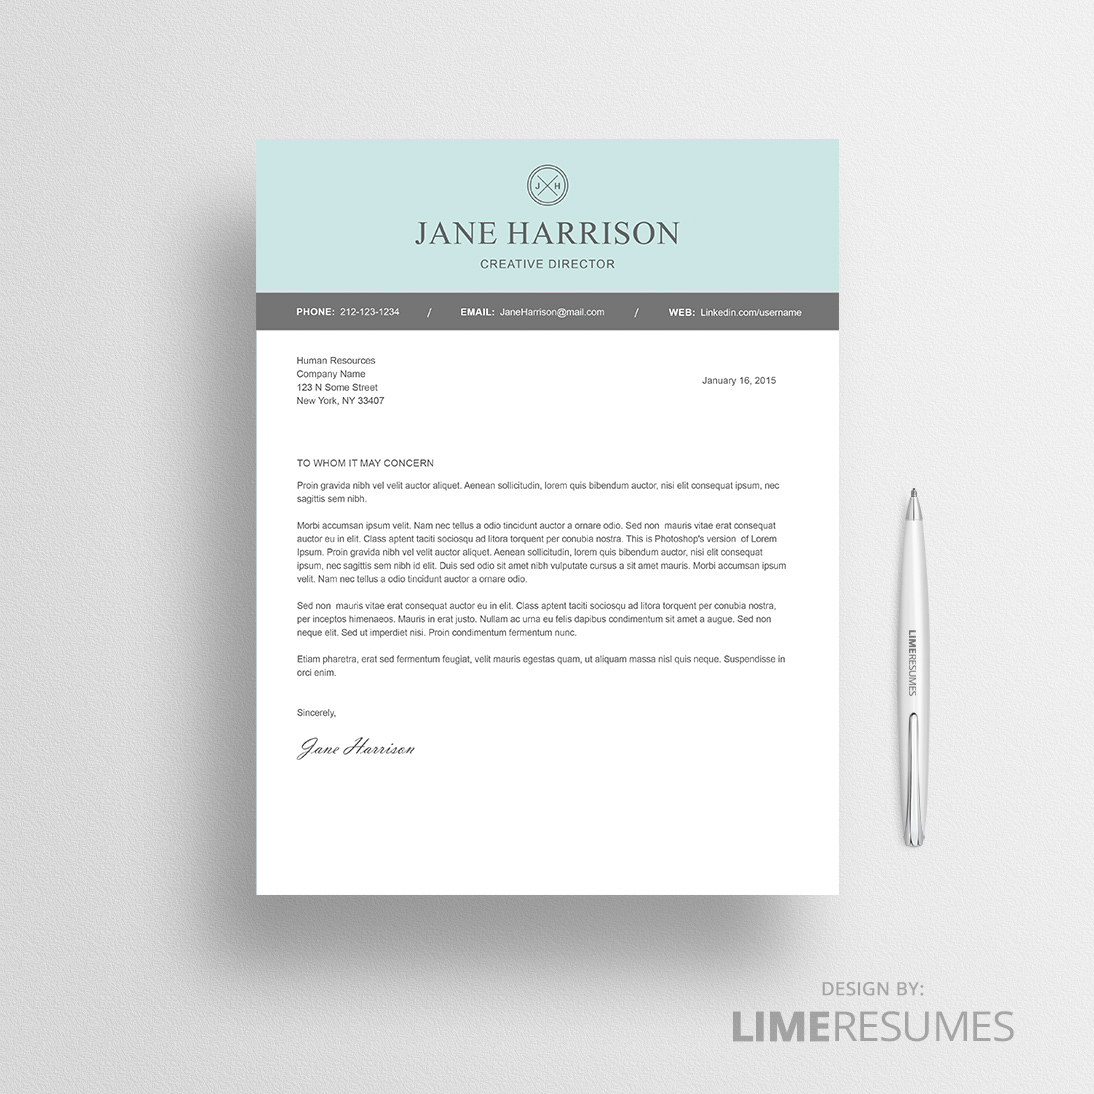 Cover Letter Template Modern